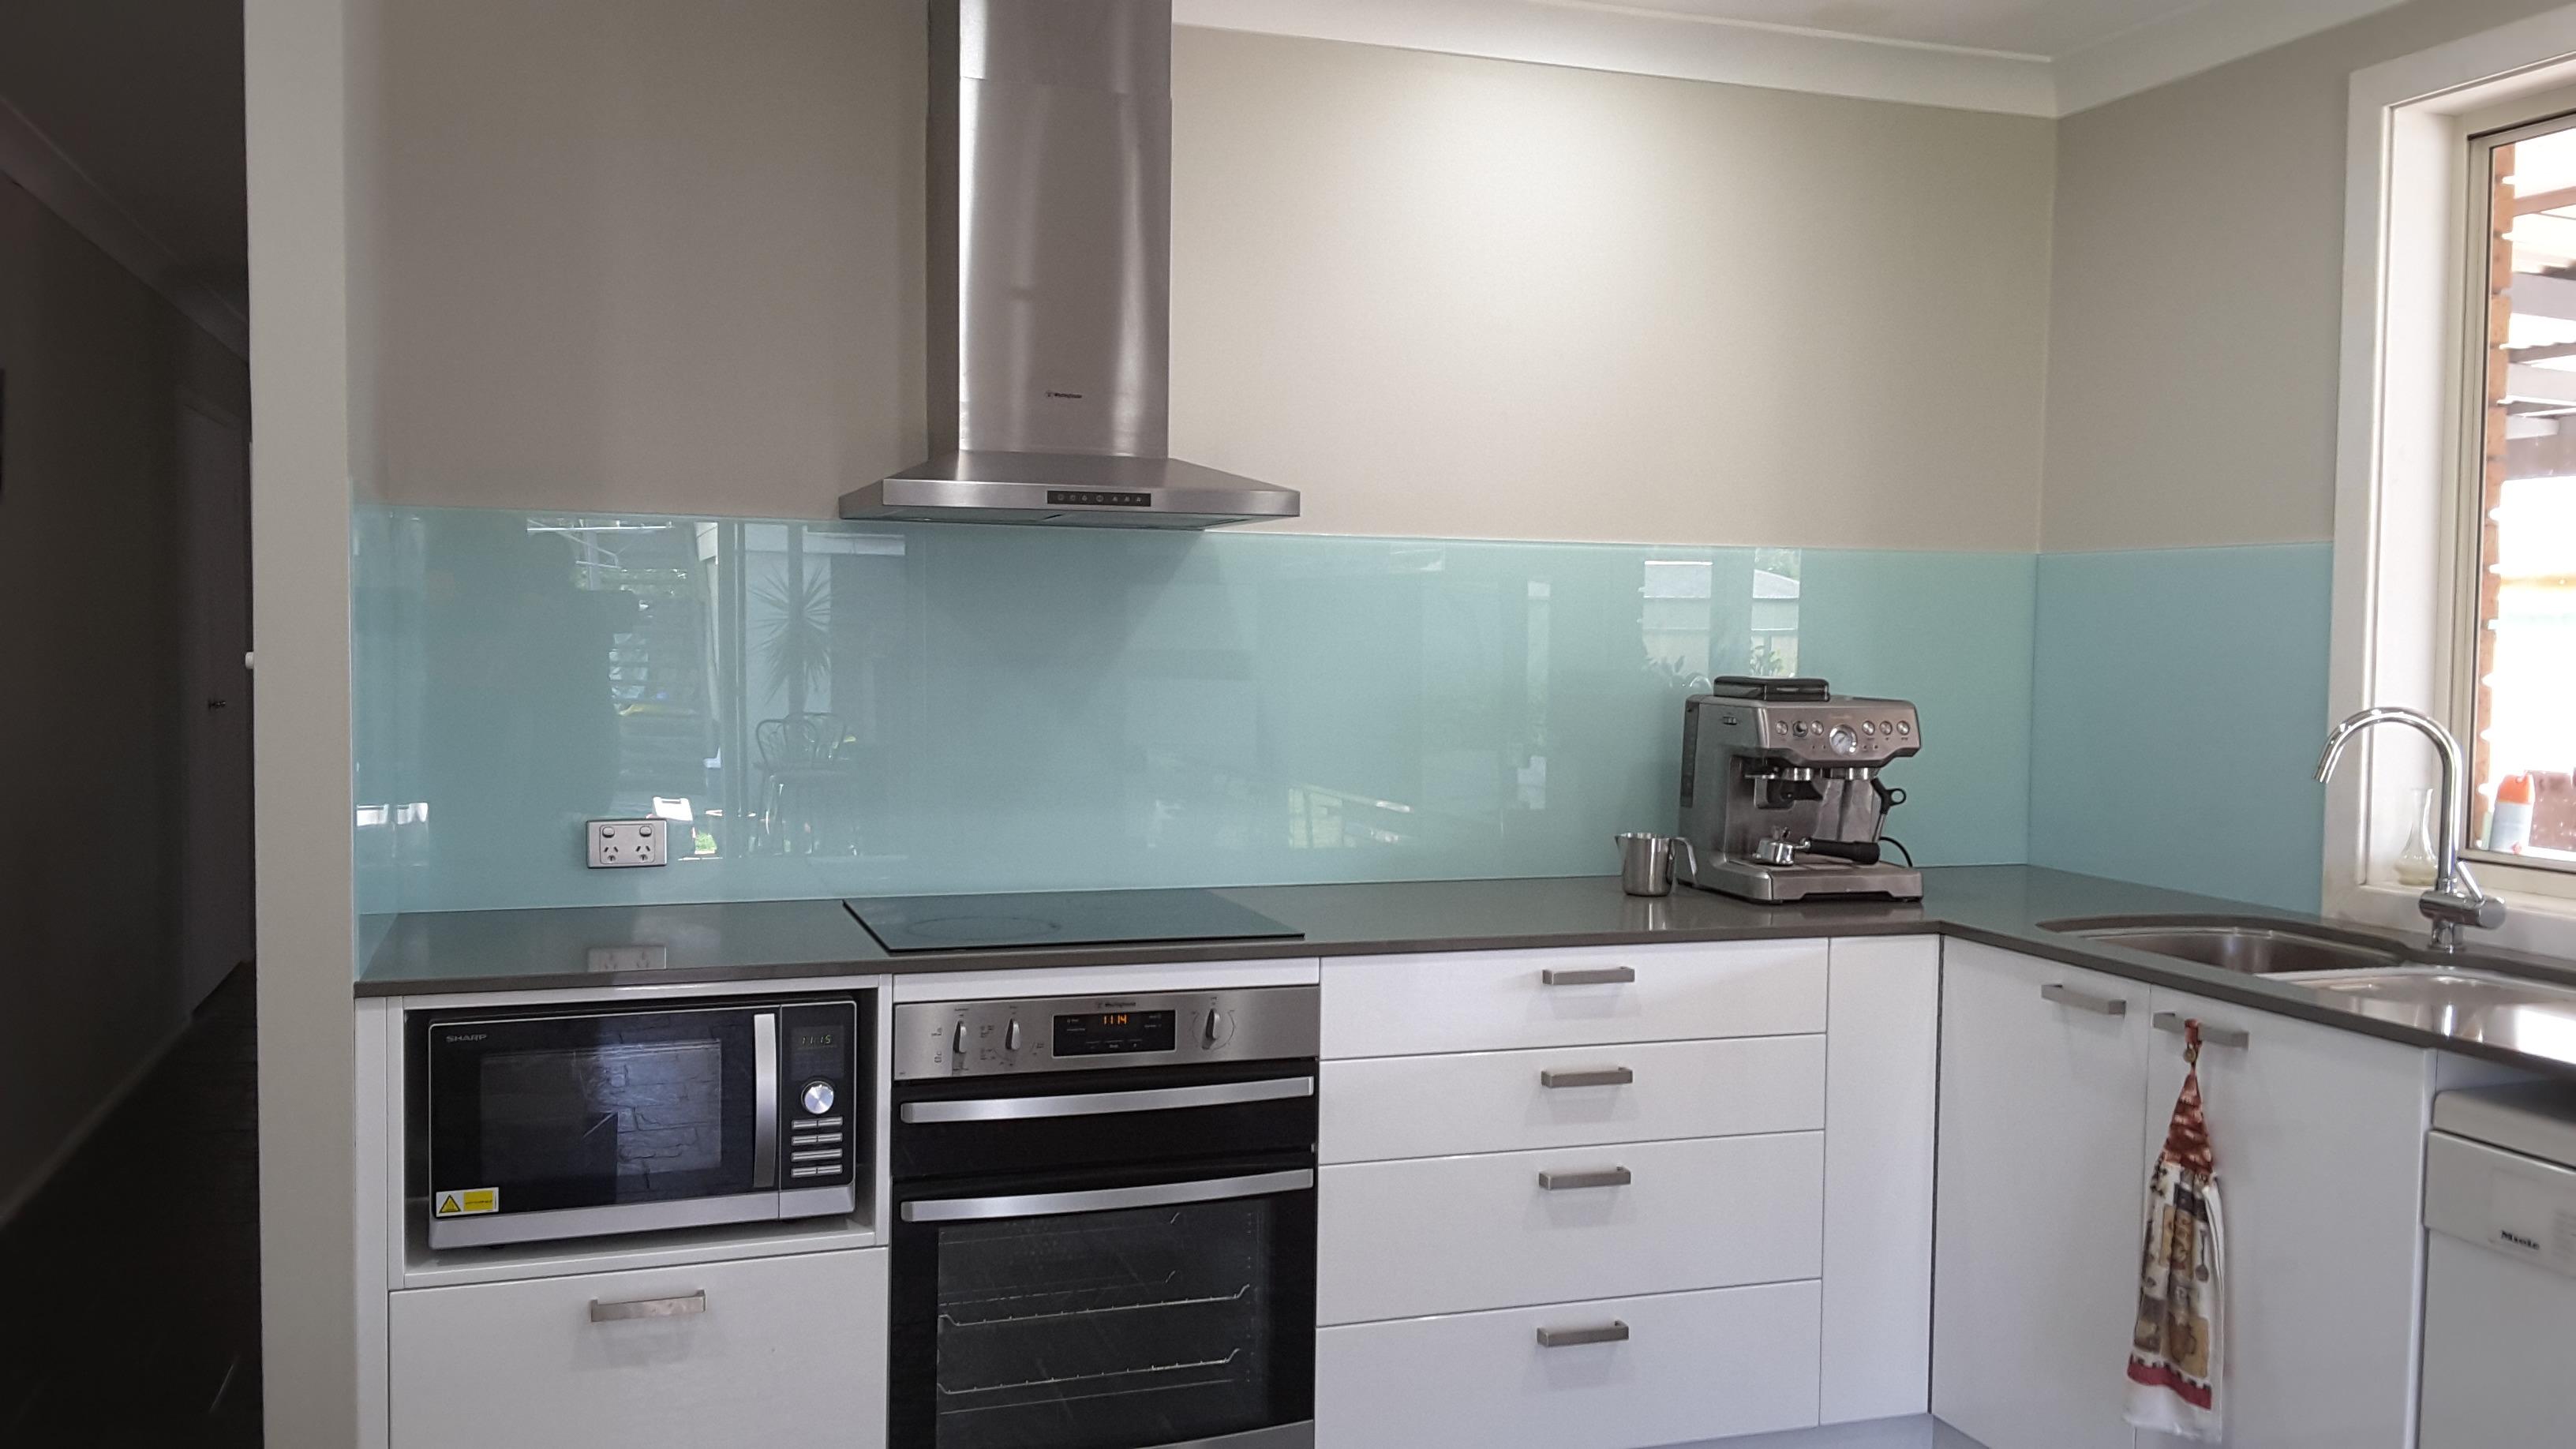 Kitchen Splashbacks : Before & After Photos – OzzieSplash Pty.Ltd